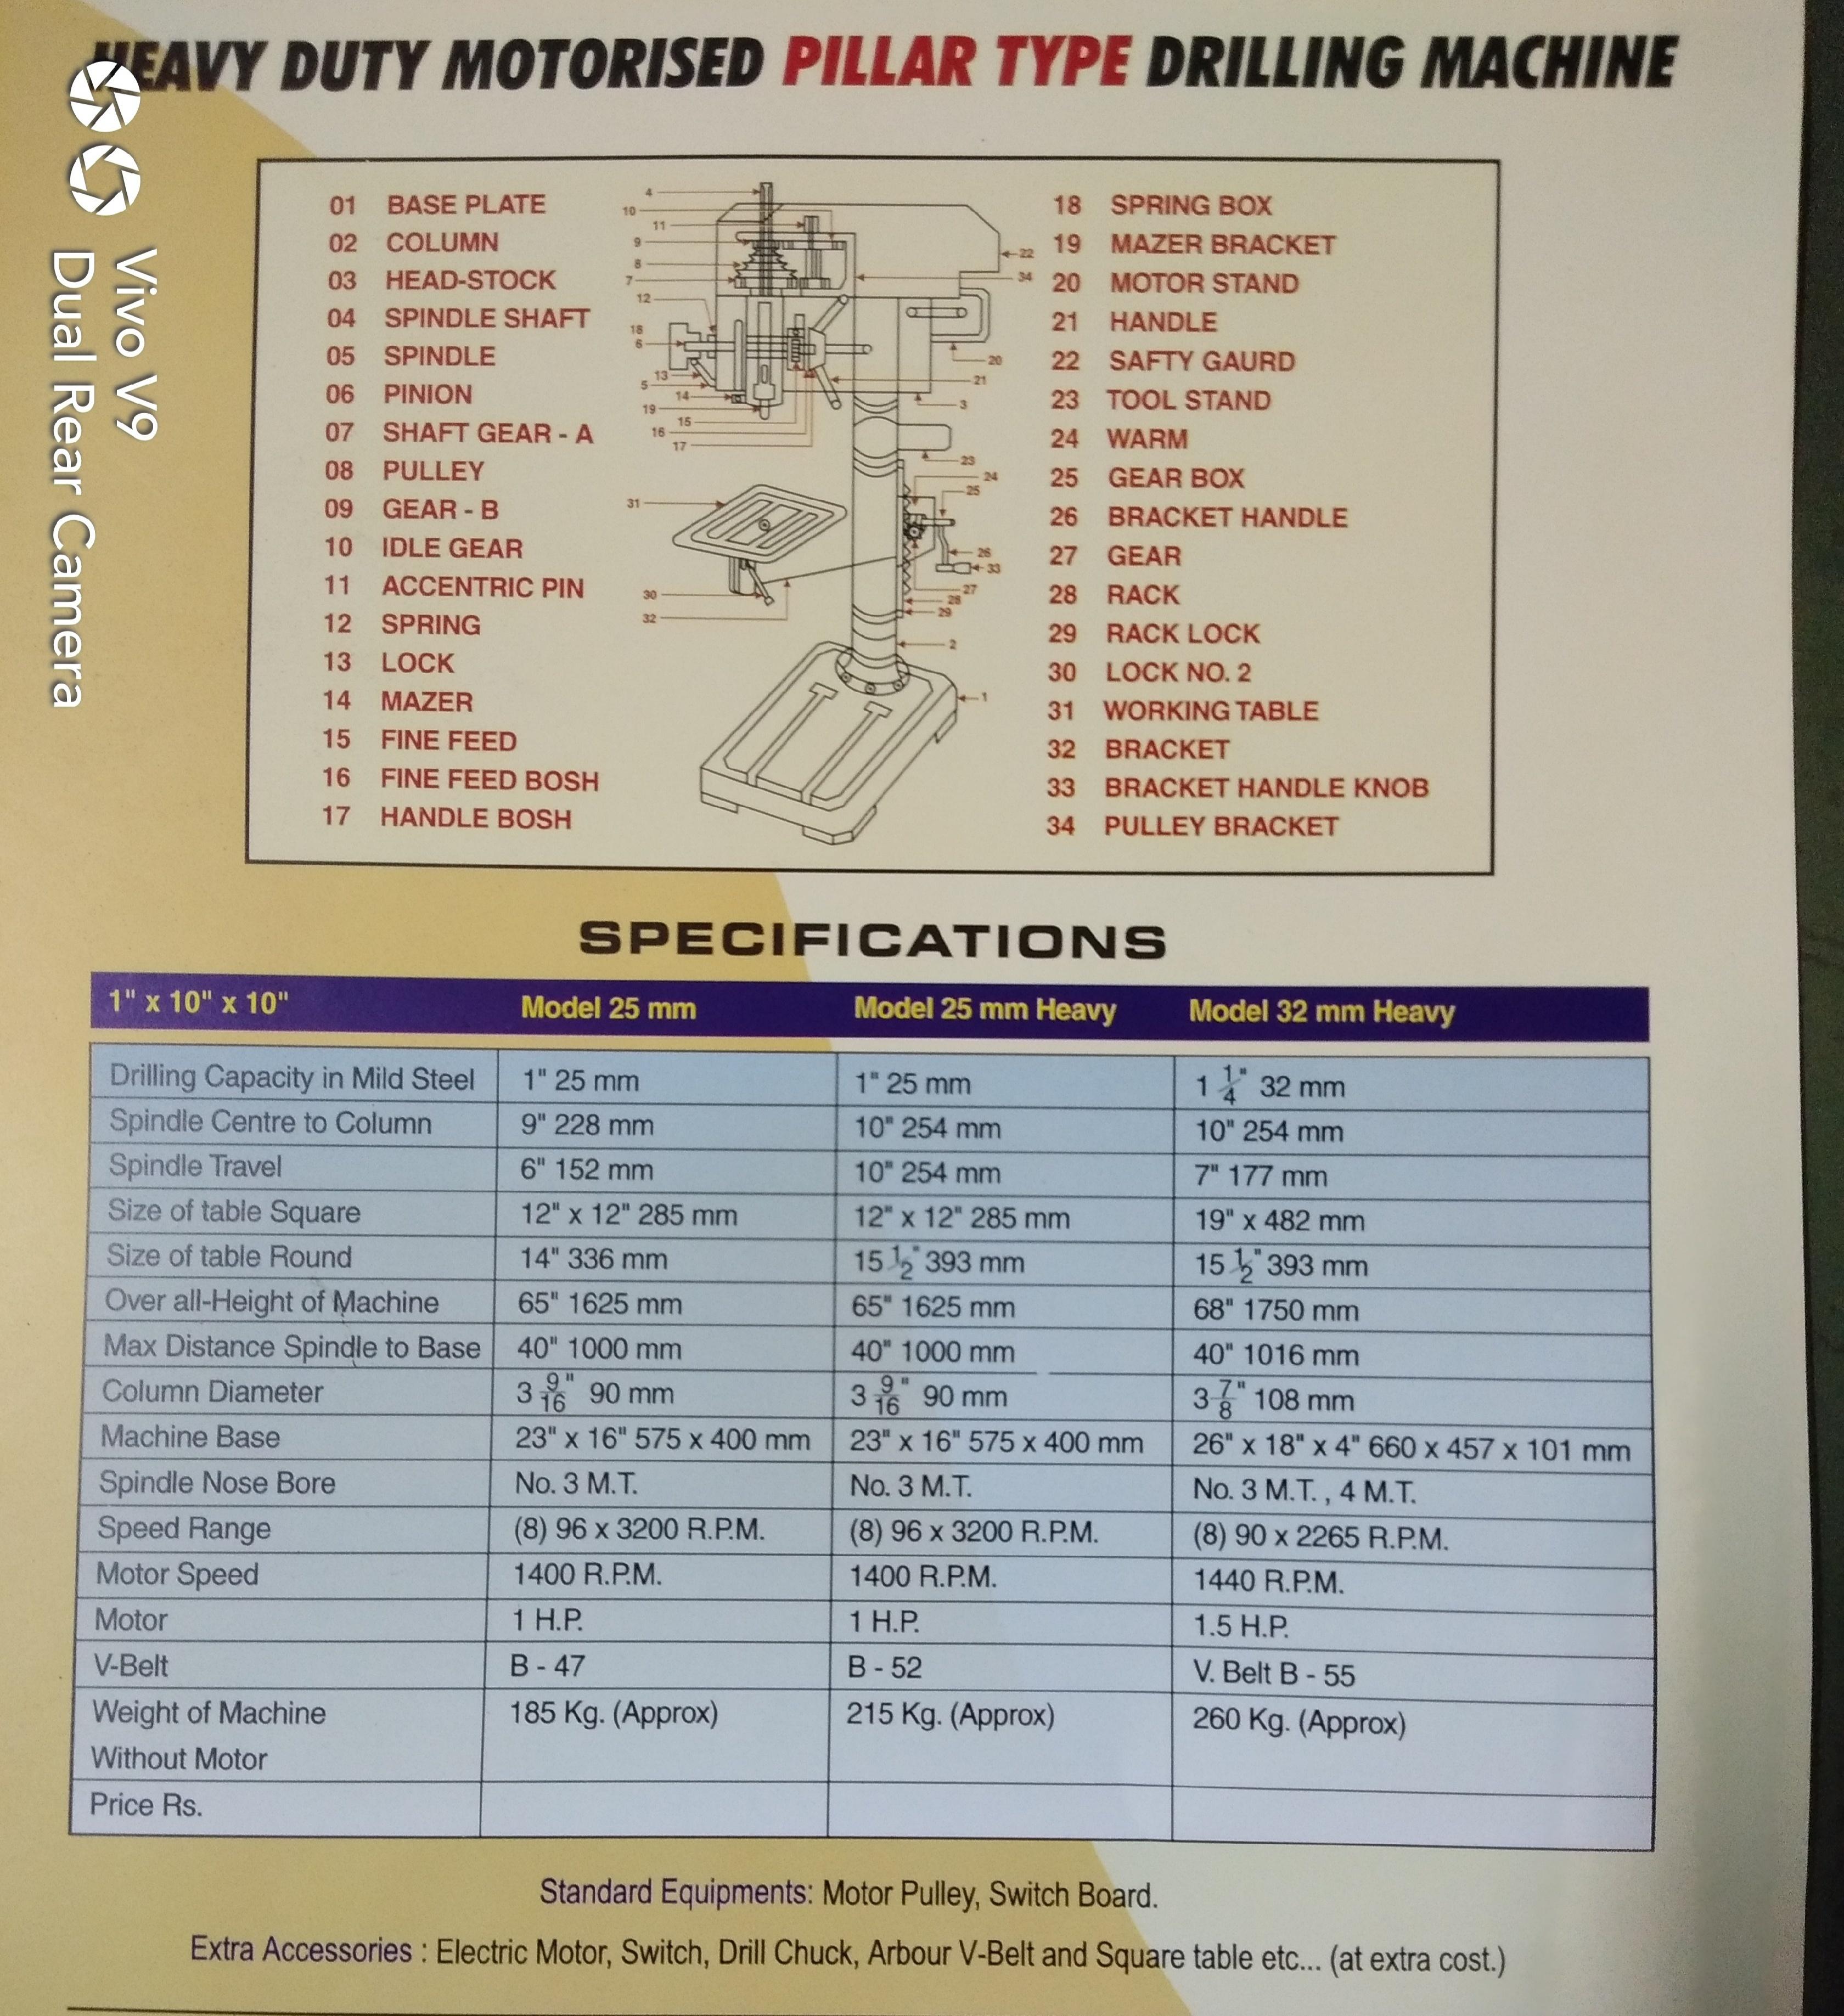 25mm Heavy Duty Pillar Drilling Machine With Fine Feed